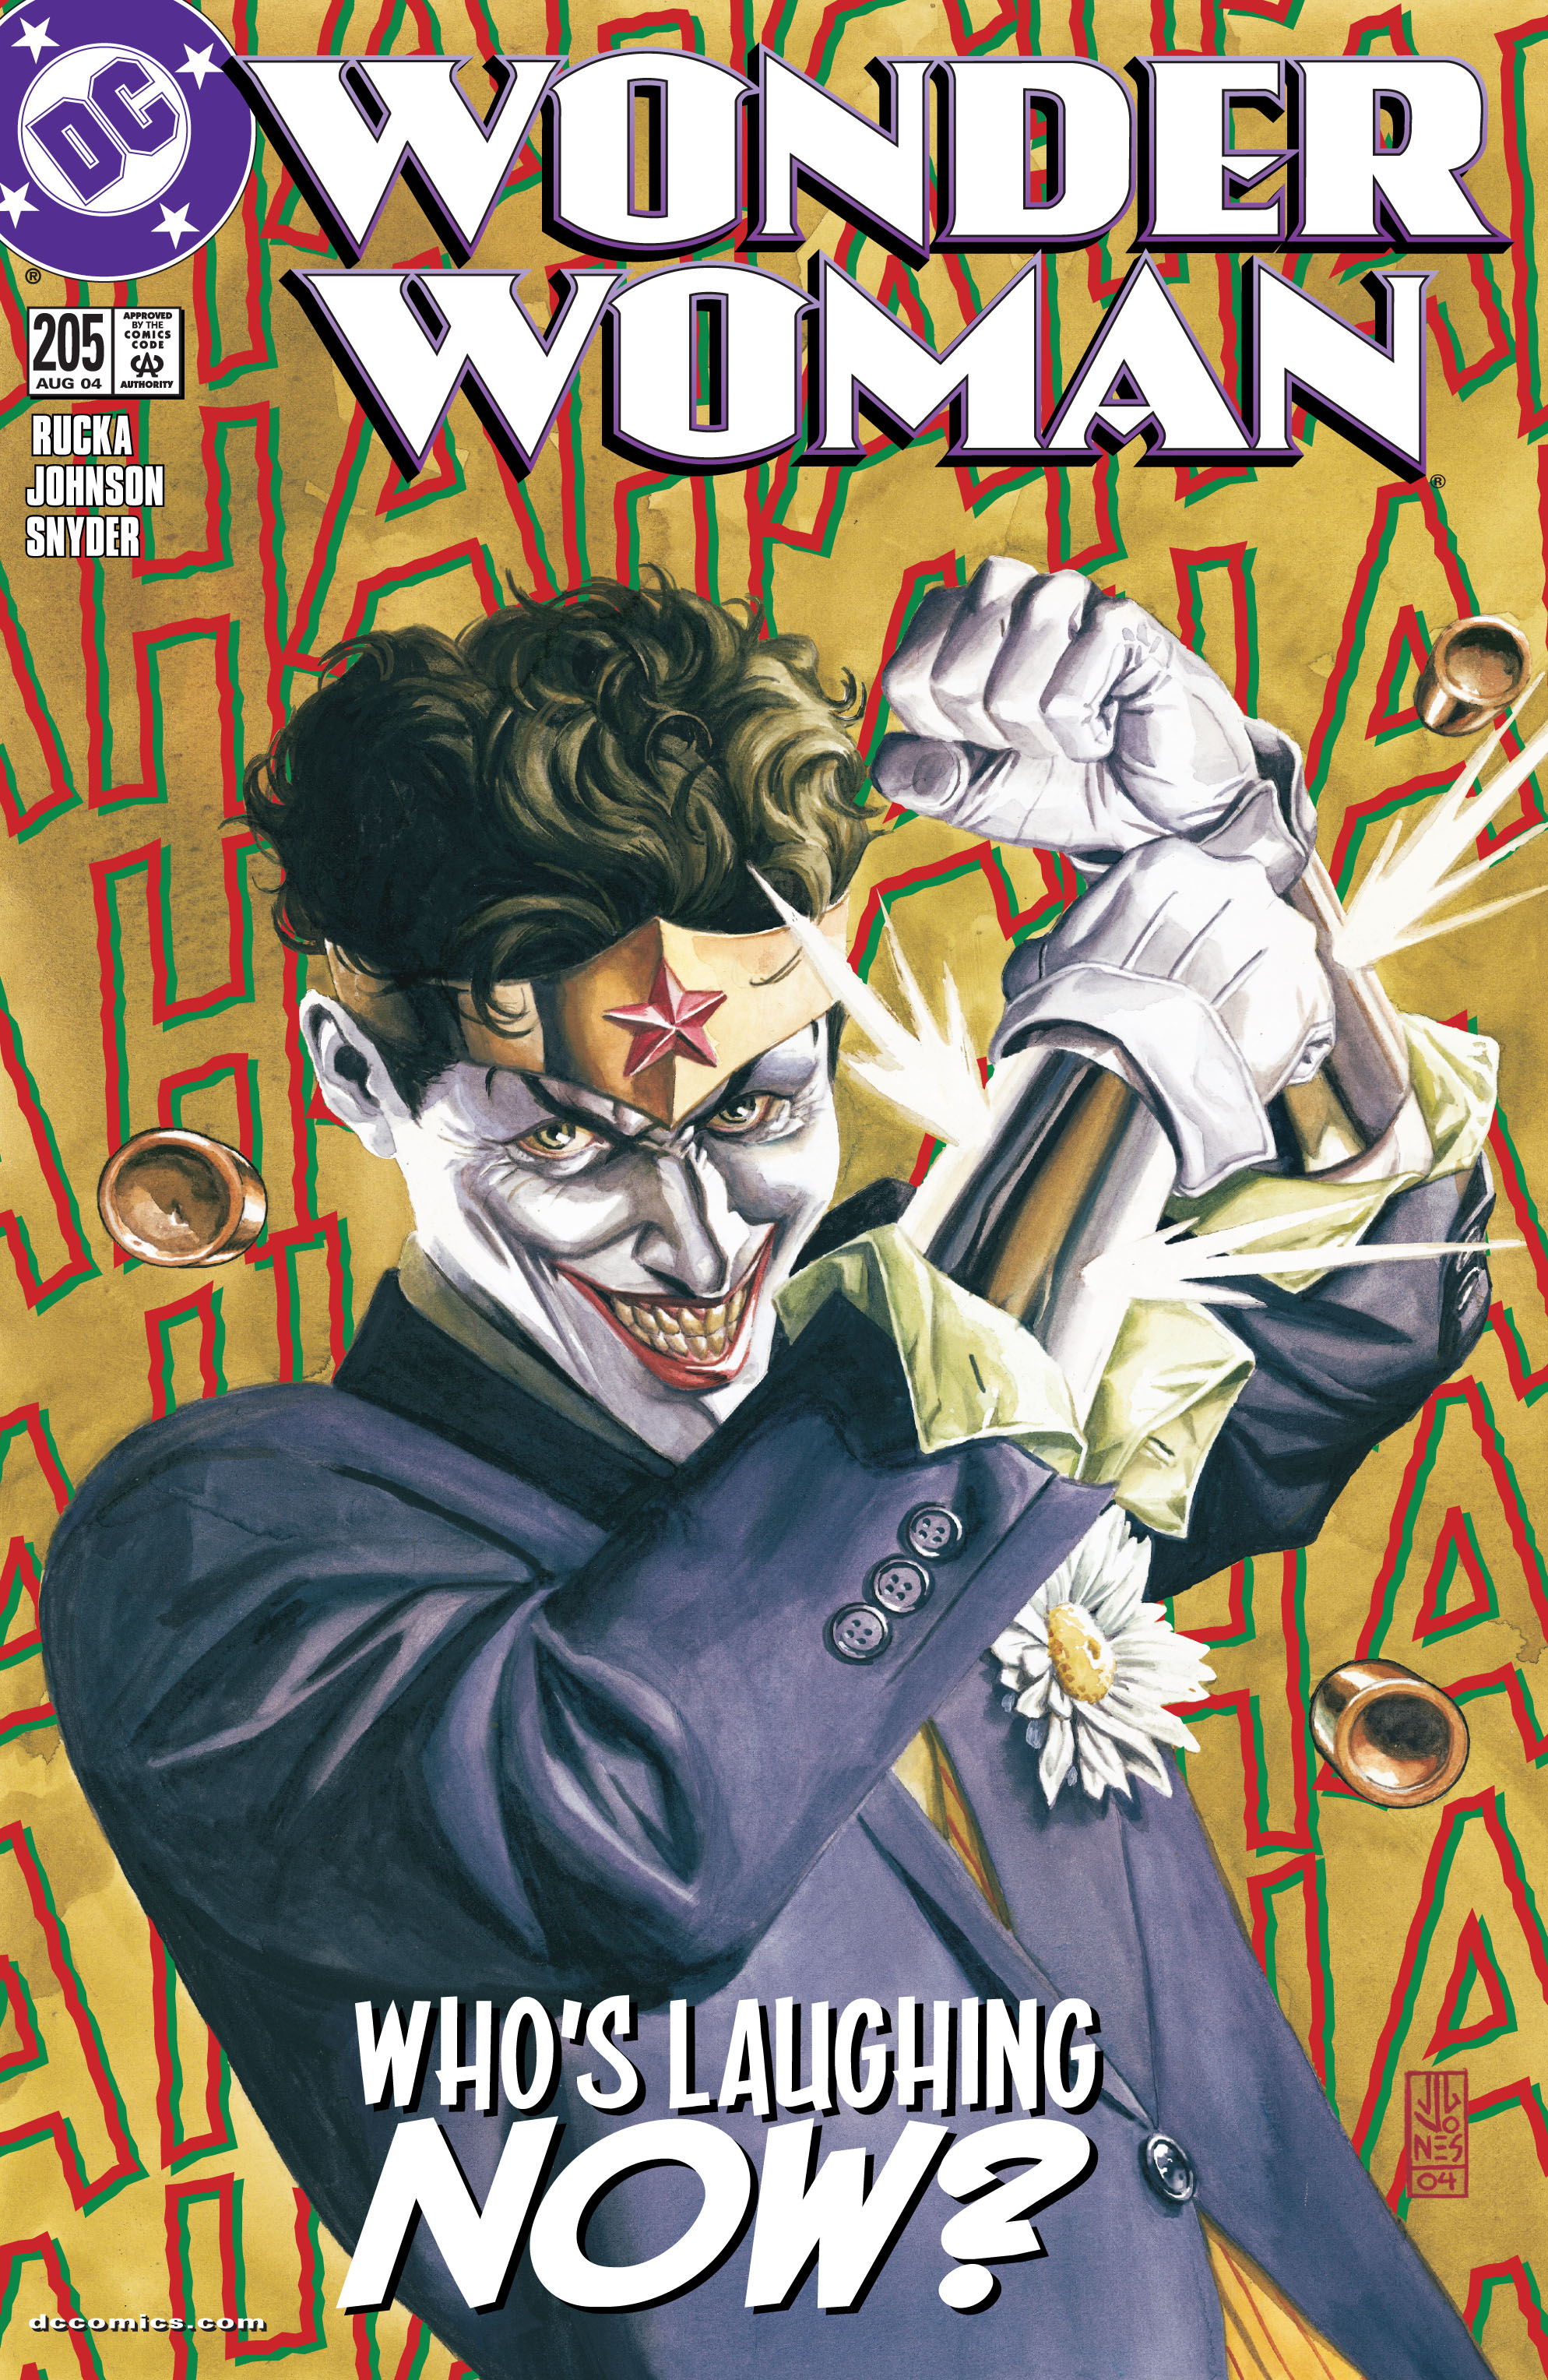 Read online Wonder Woman (1987) comic -  Issue #205 - 1